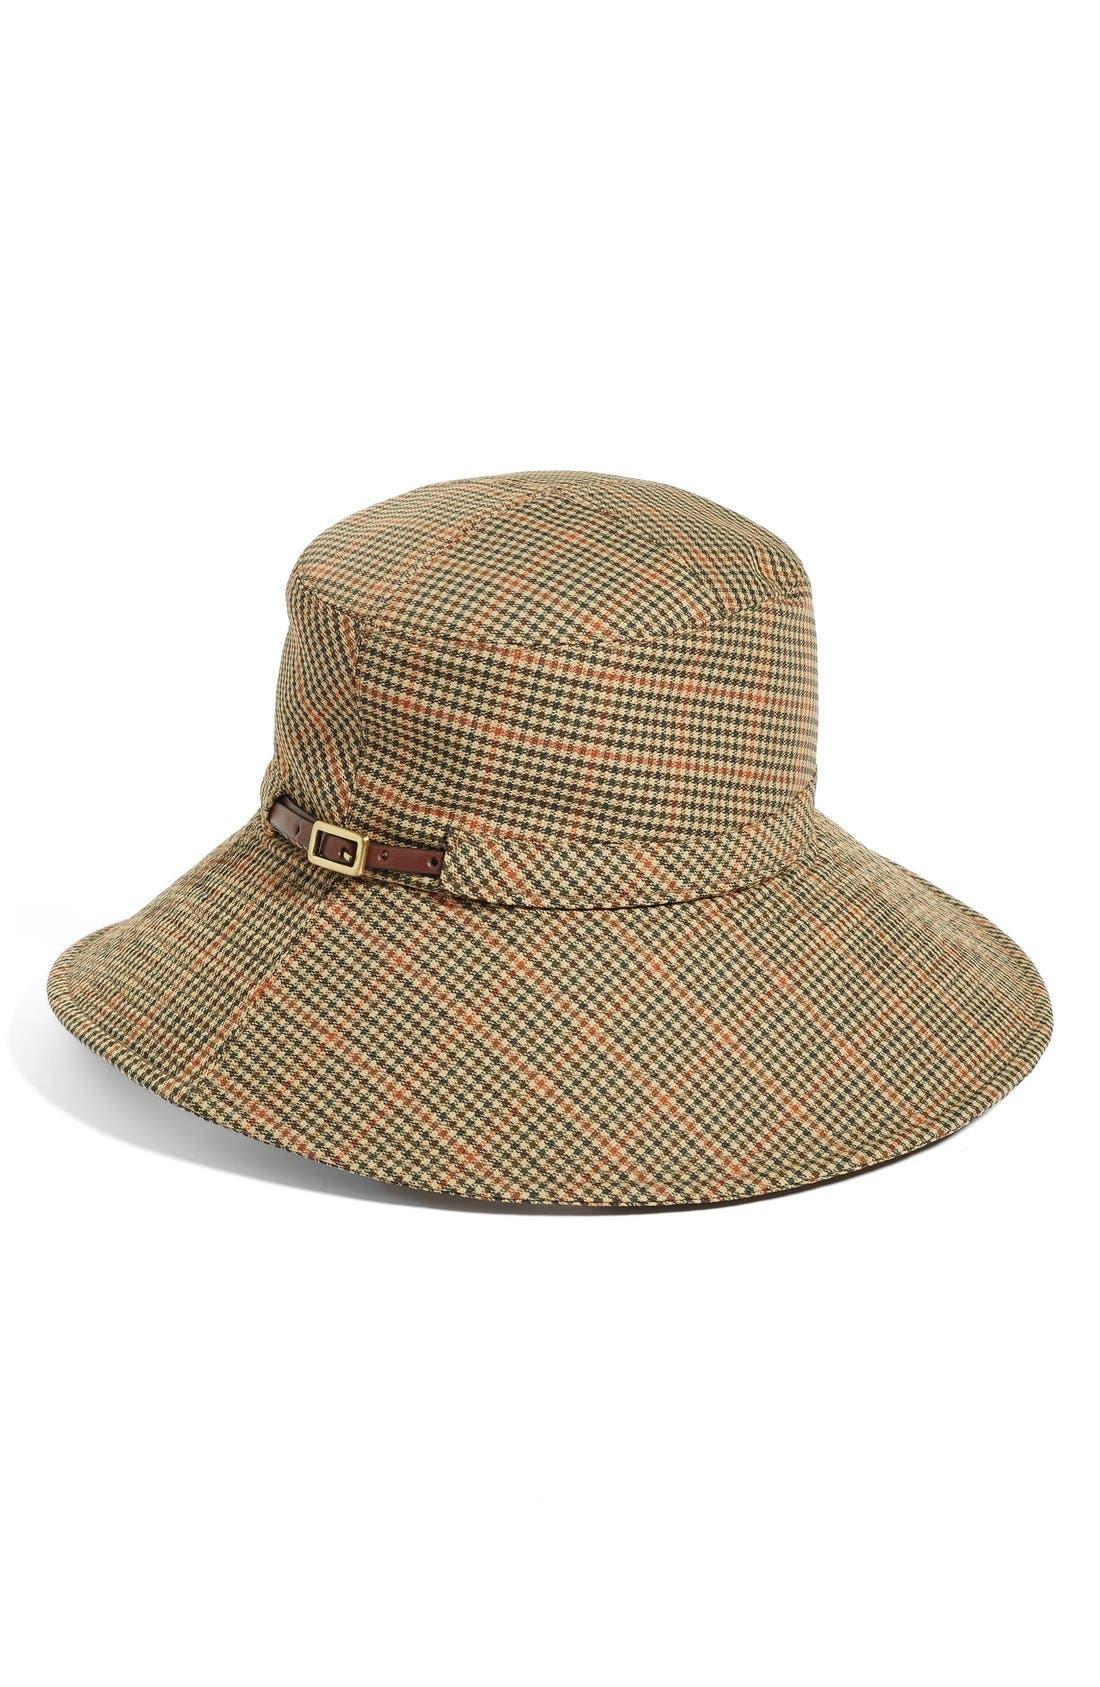 Water Repellent Nylon Rain Hat,                             Alternate thumbnail 2, color,                             Tan Check